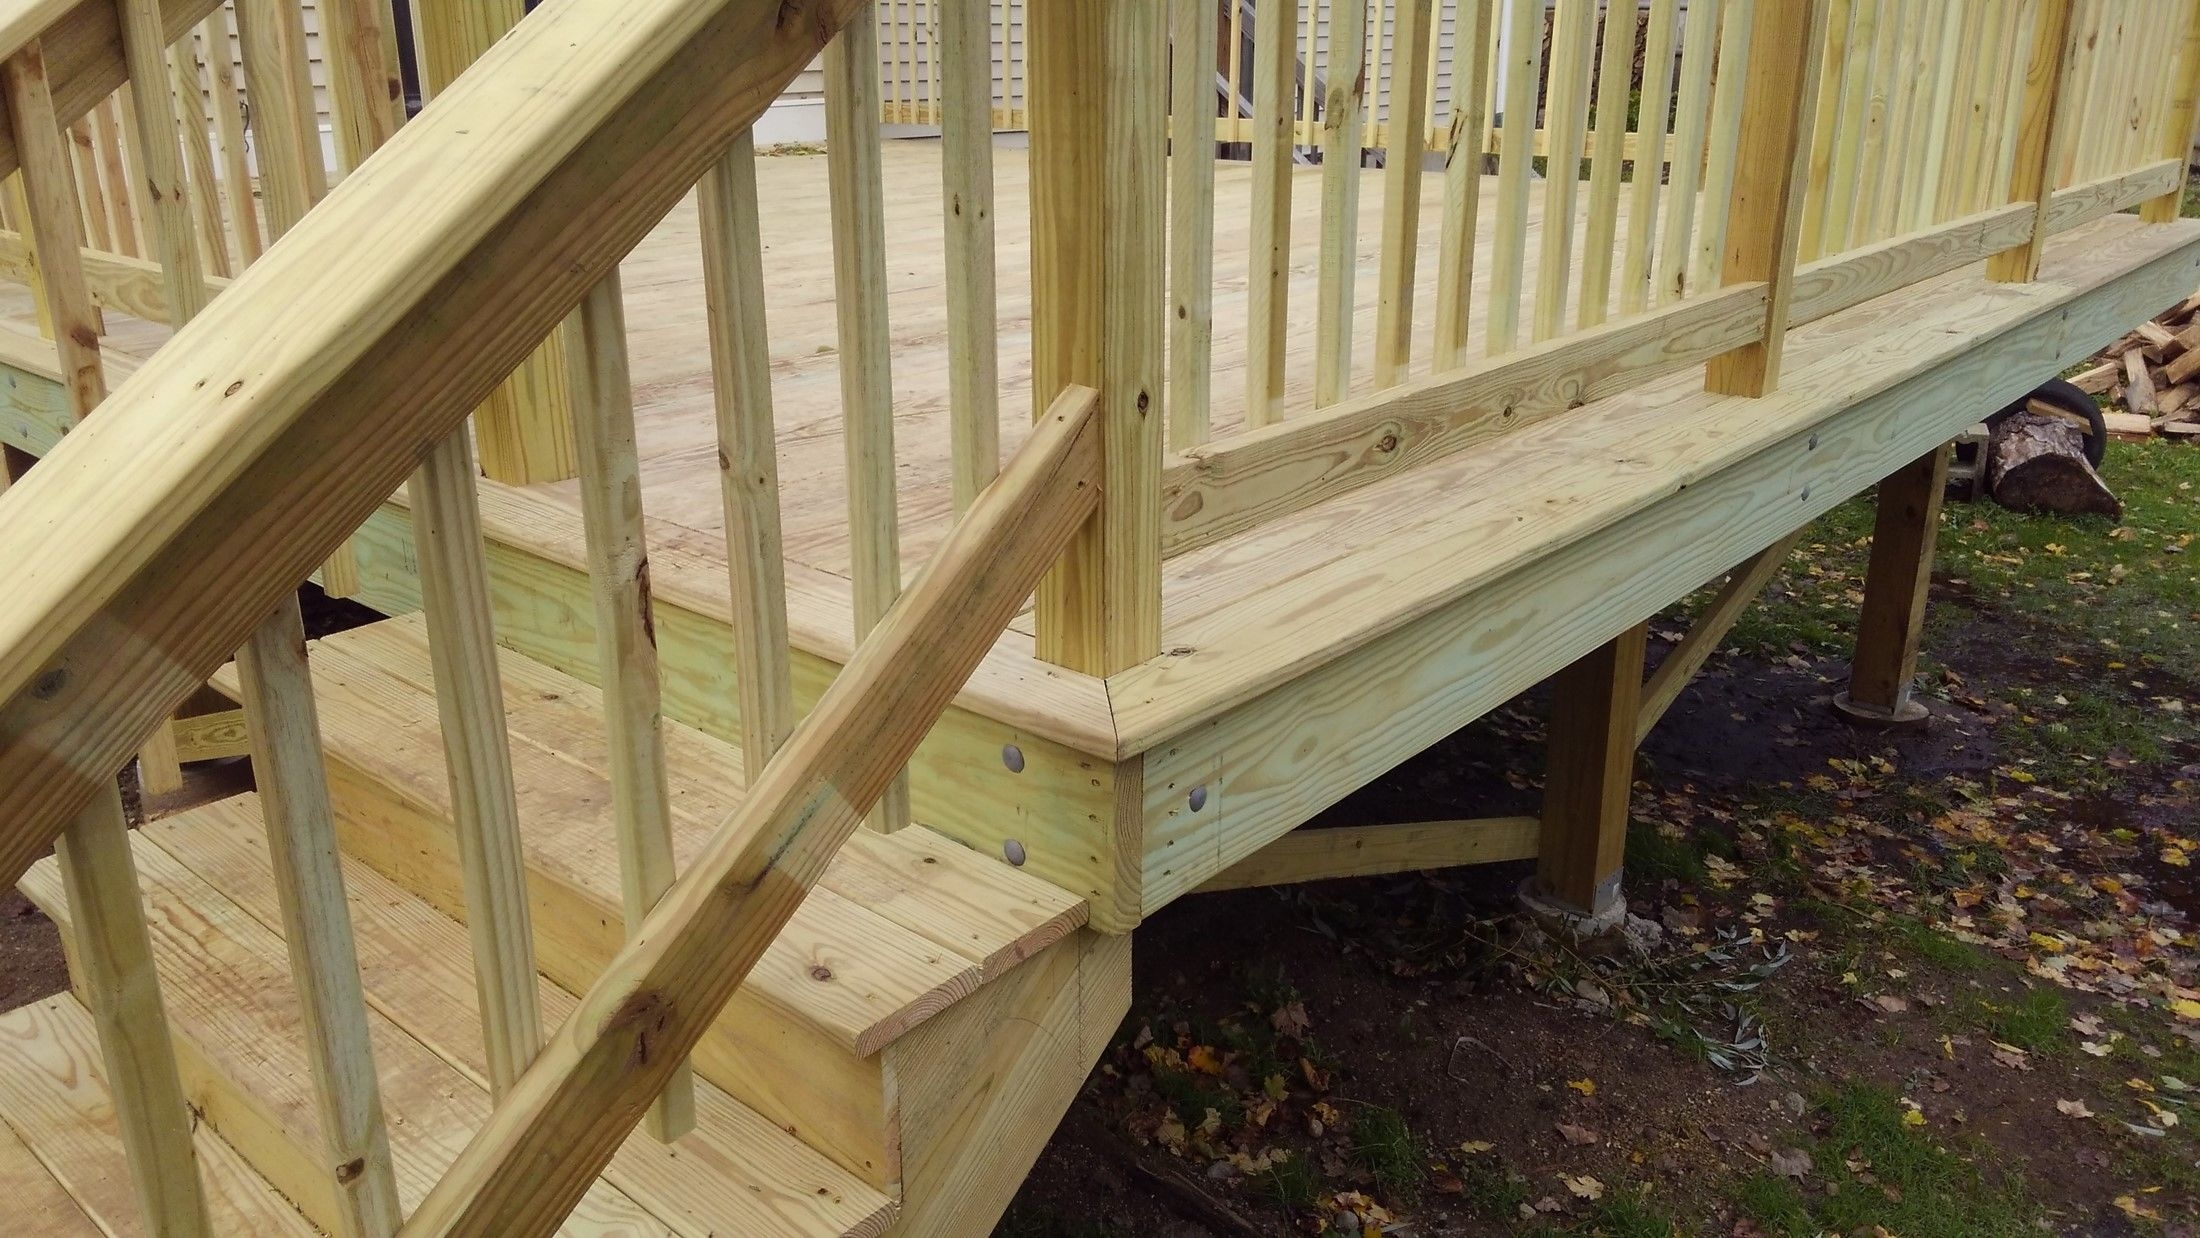 New Pressure Treated Deck Picture 7694 Decks Com   Pressure Treated Stair Handrail   Basic Deck   Deck Rail   Cedar   Guard   Concrete Step